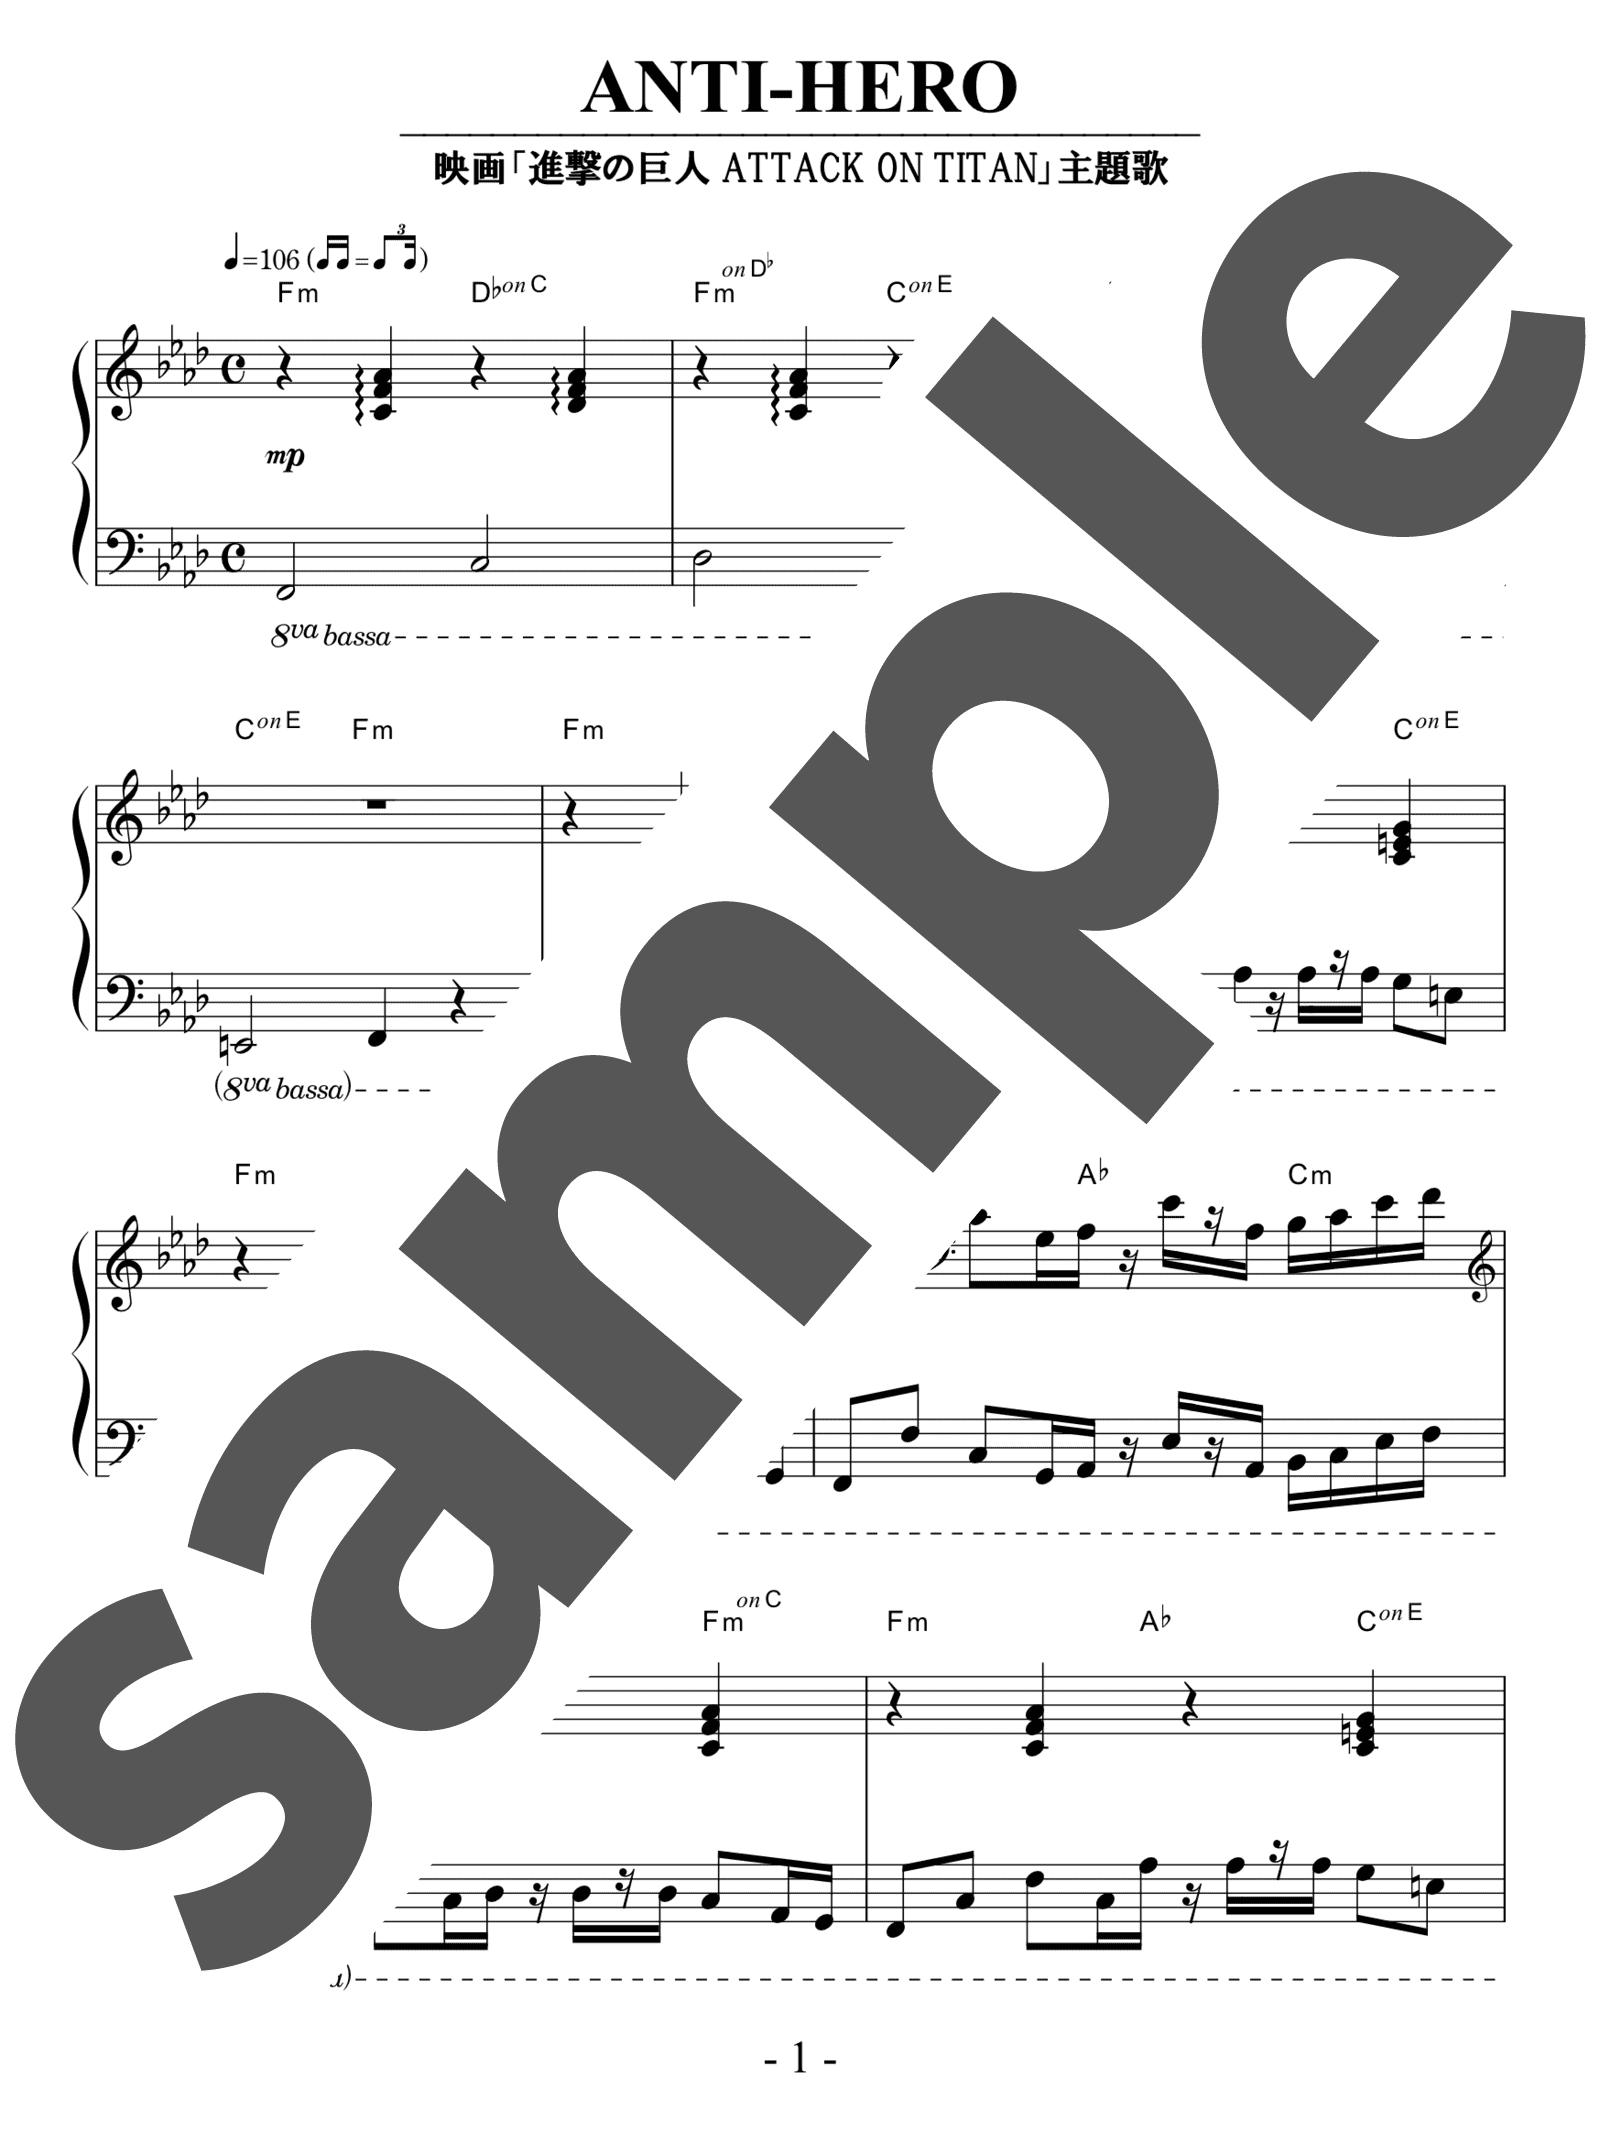 「ANTI-HERO」のサンプル楽譜